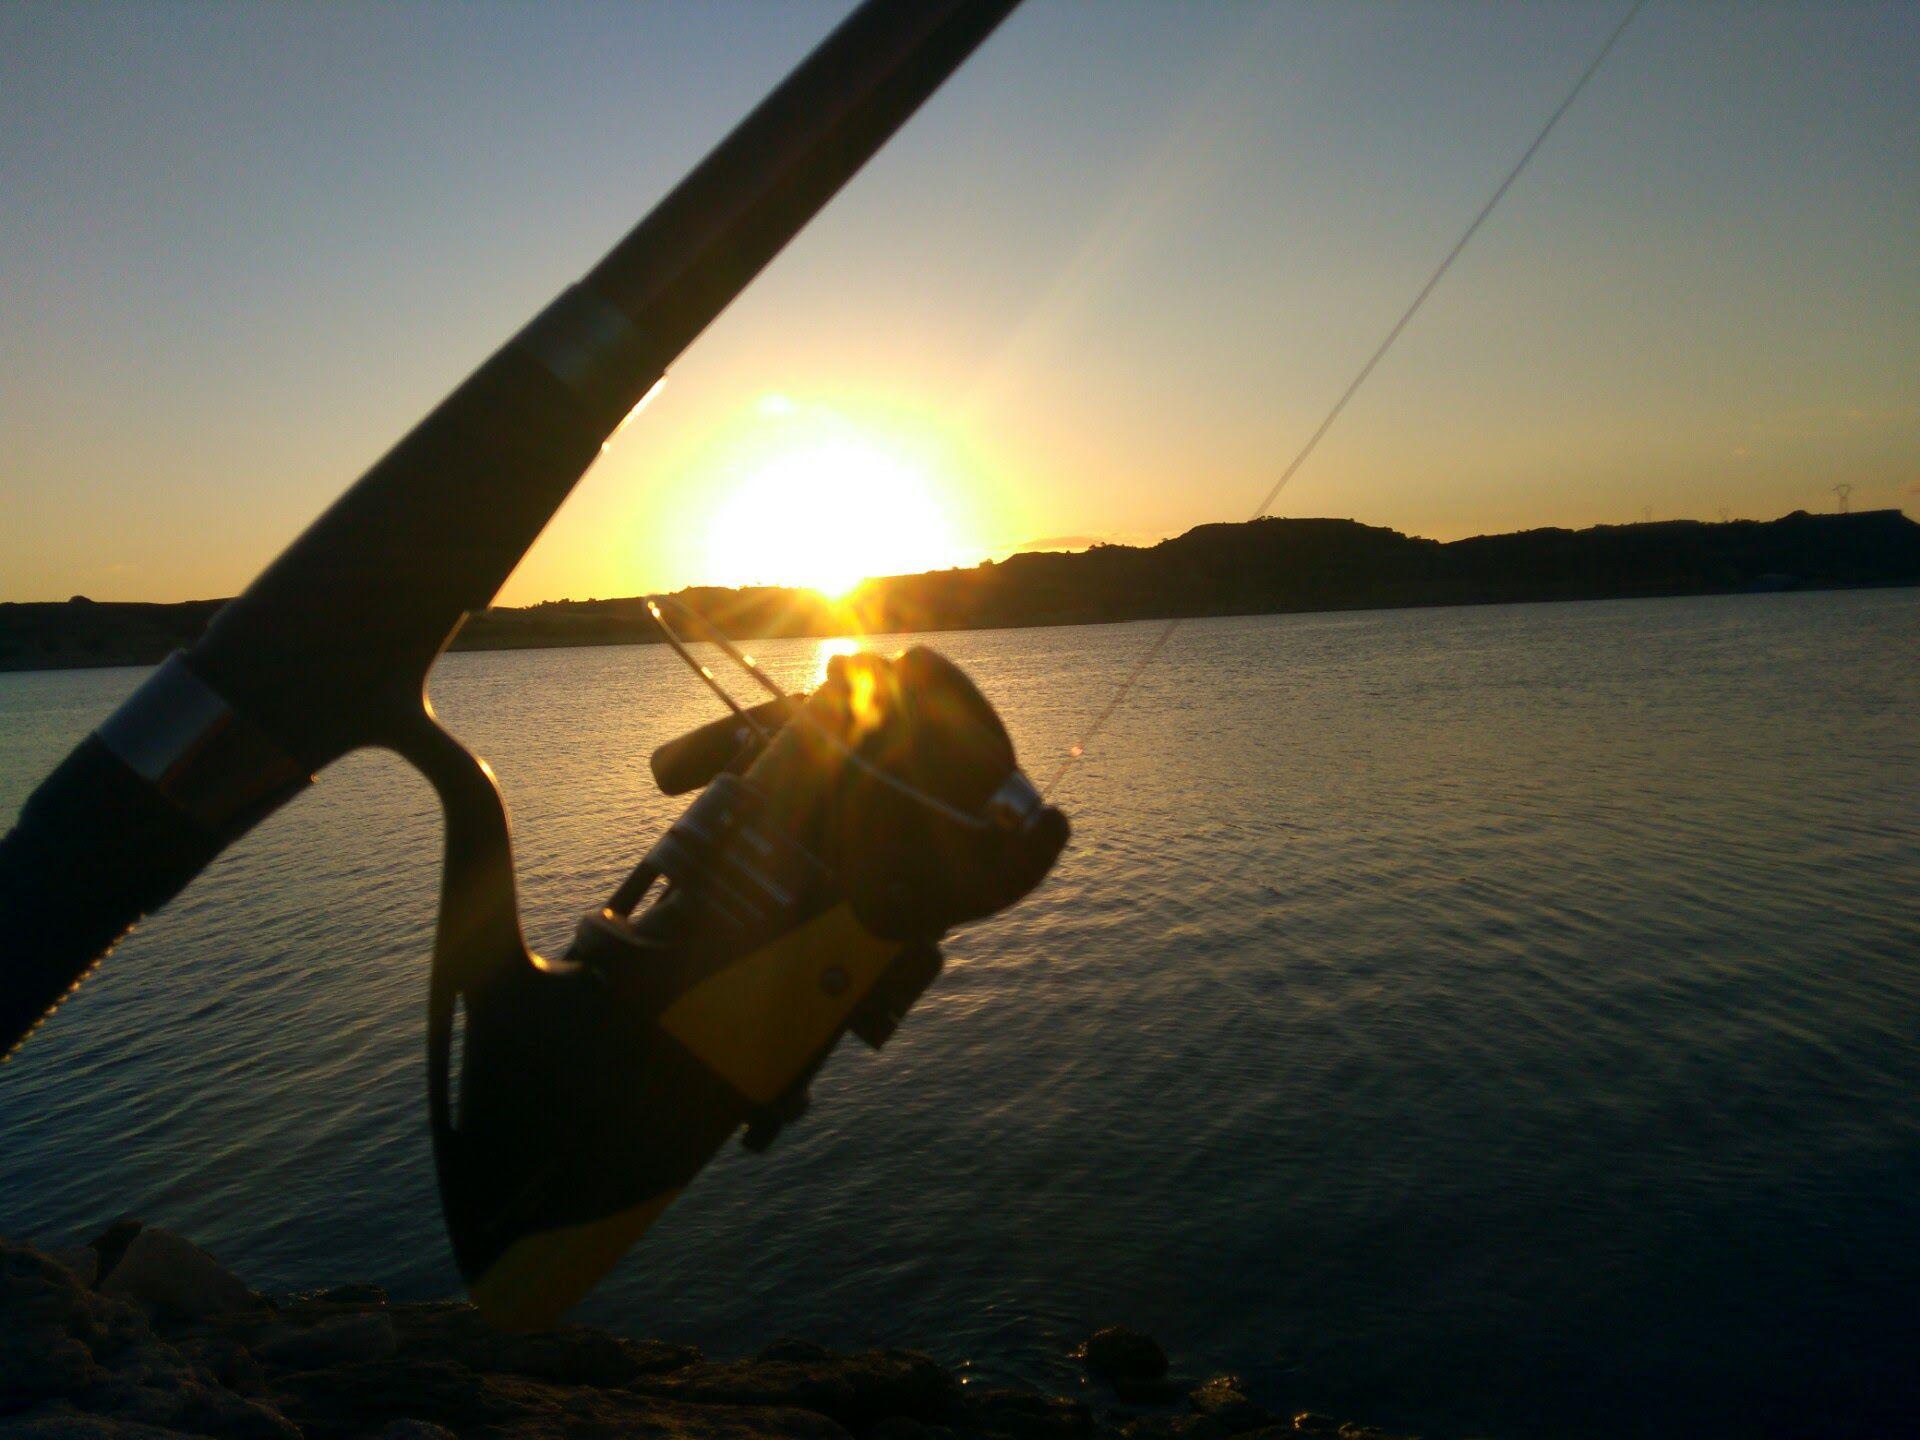 L alba a Caspe  1 Caspe#Jordi gonzalez mendez 33